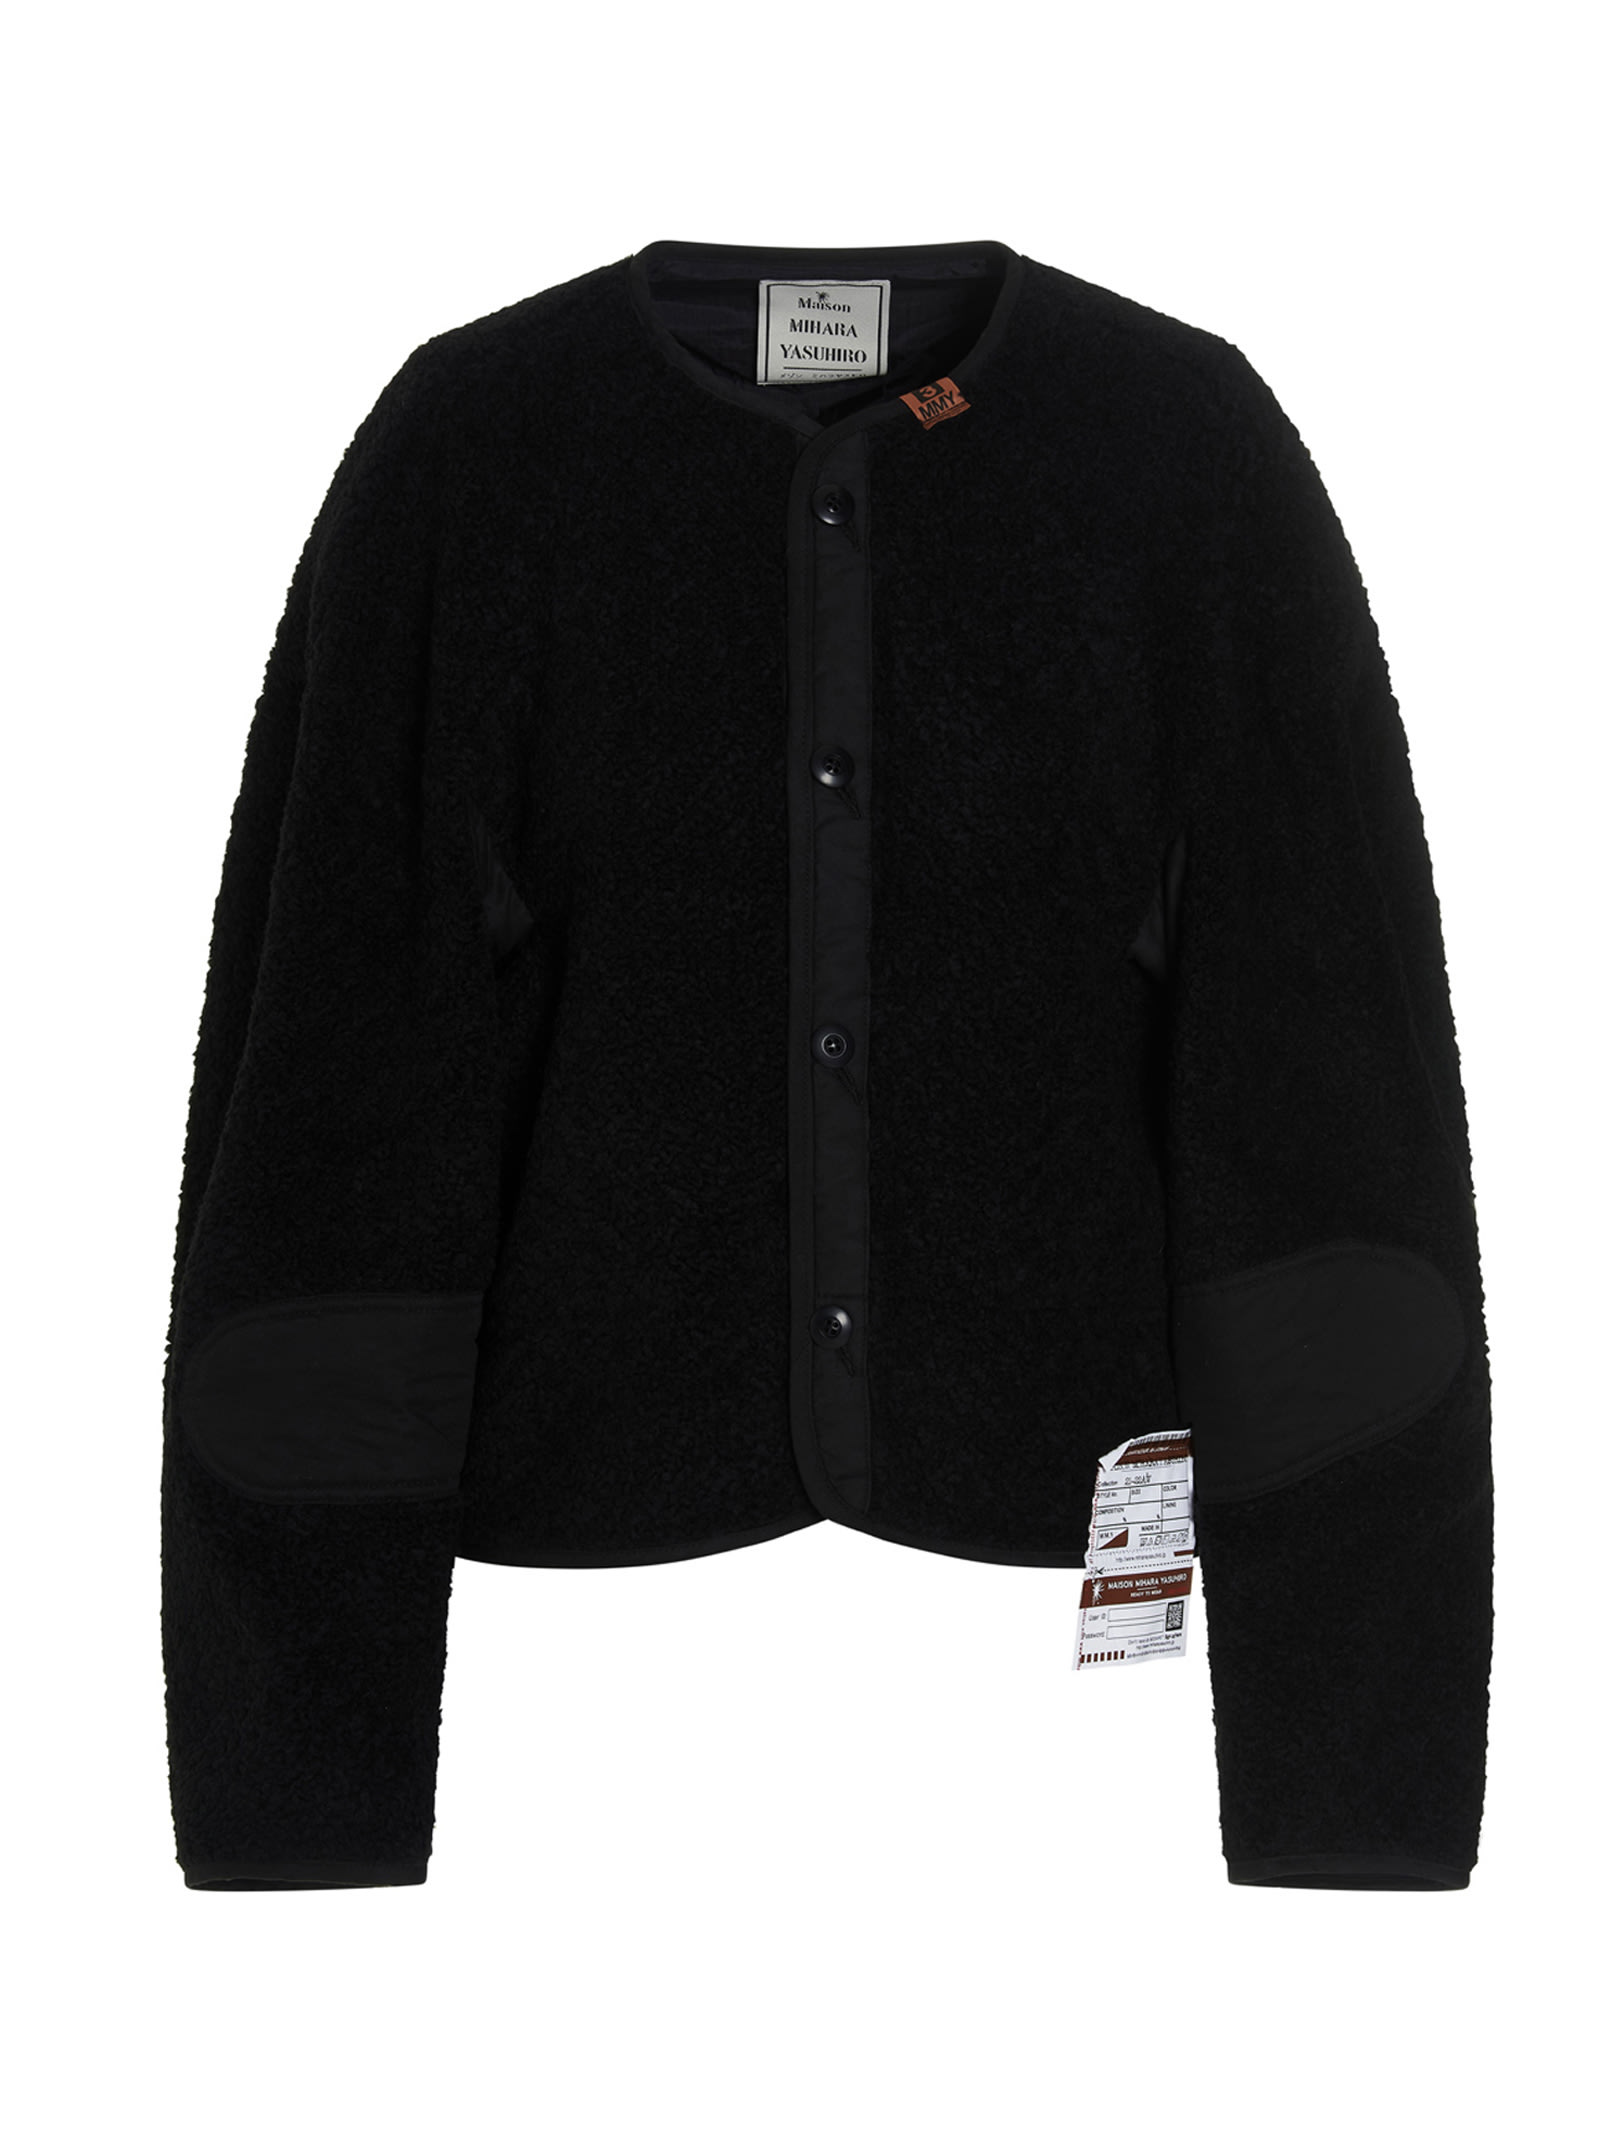 wide Back Military Jacket